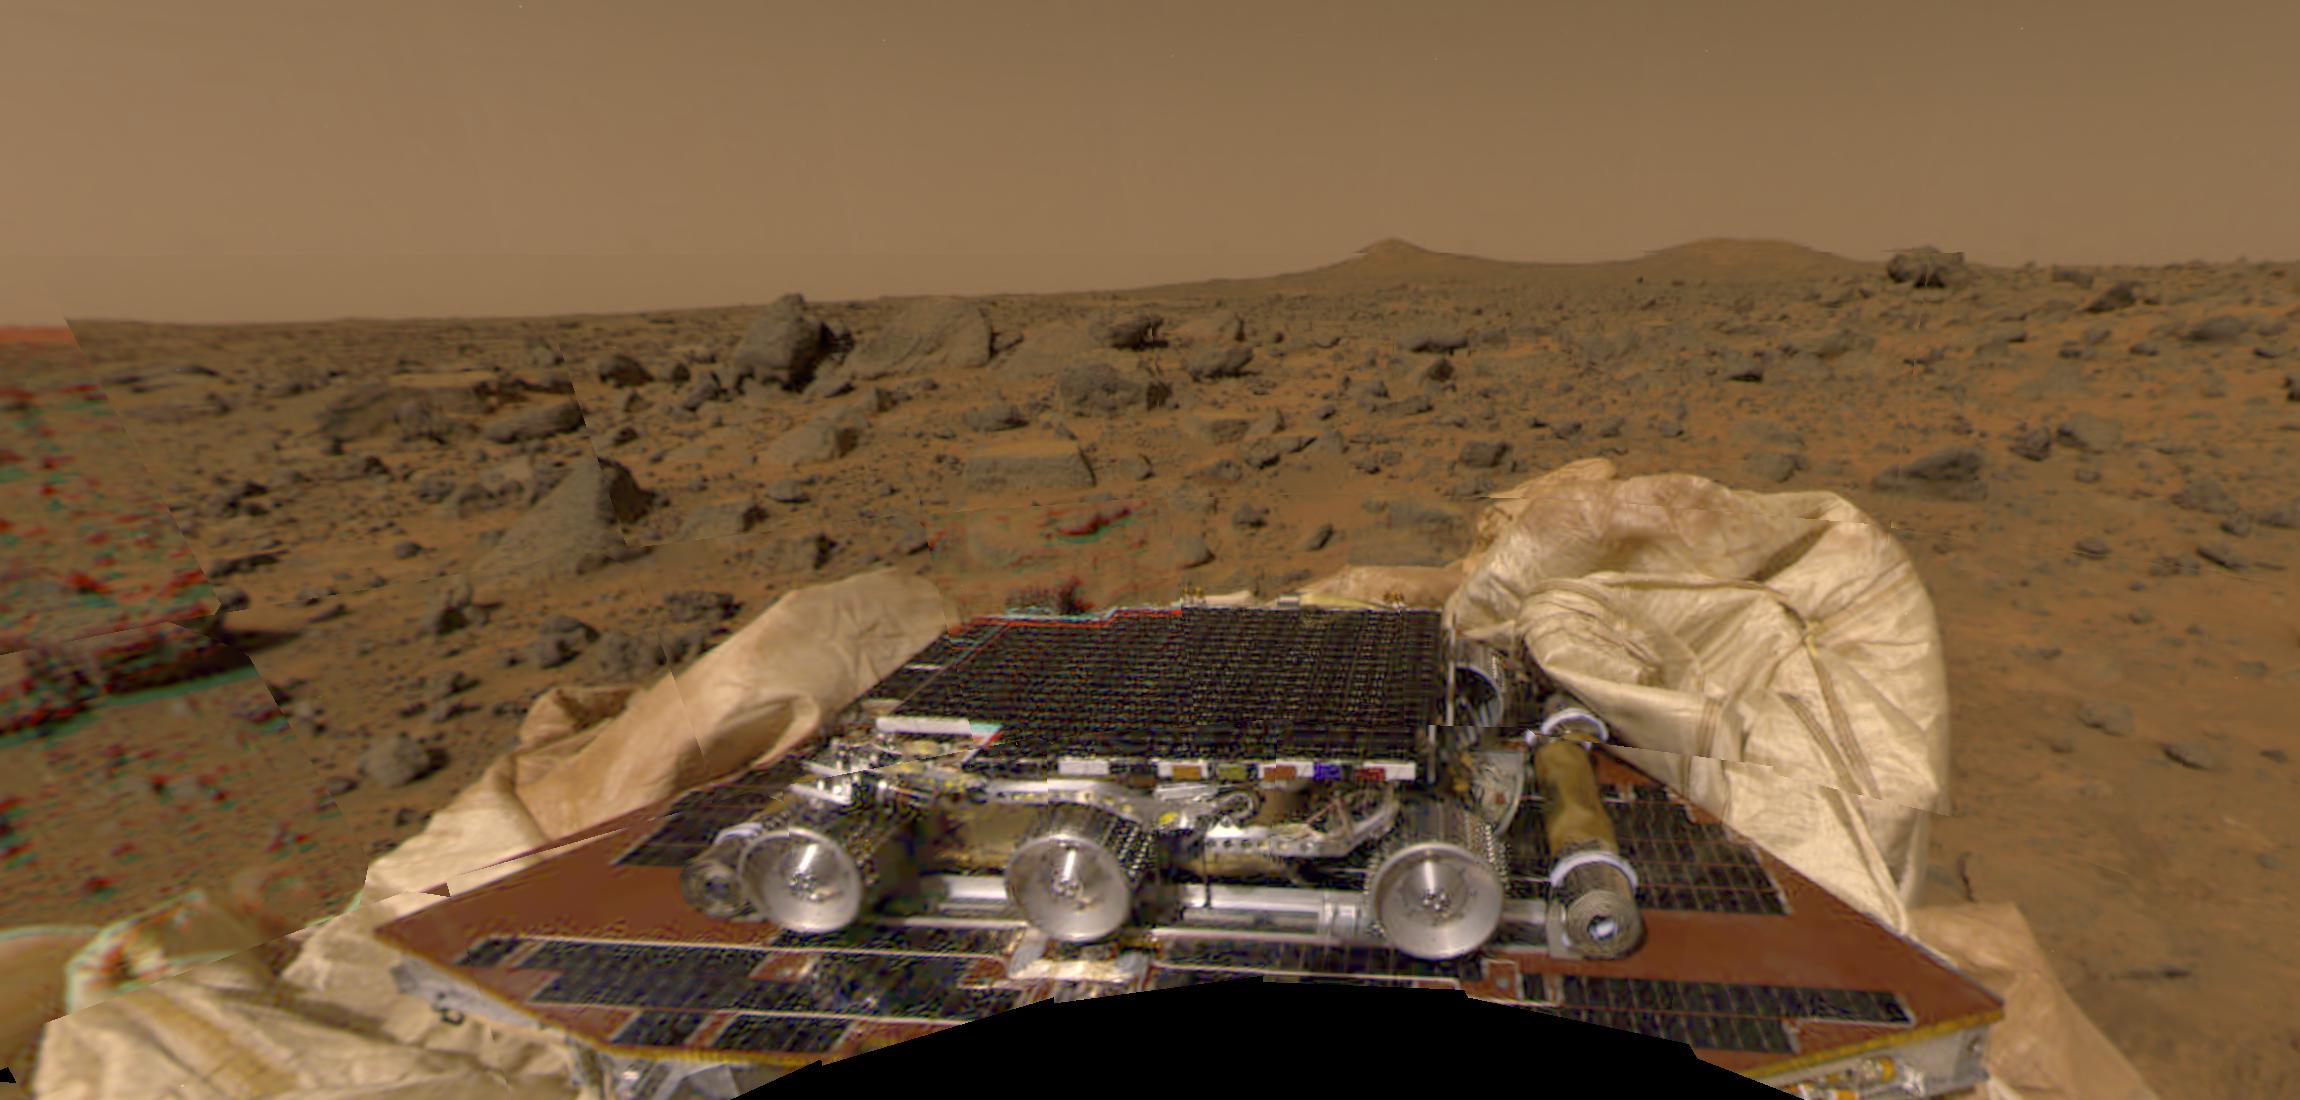 curiosity rover landing date - photo #37